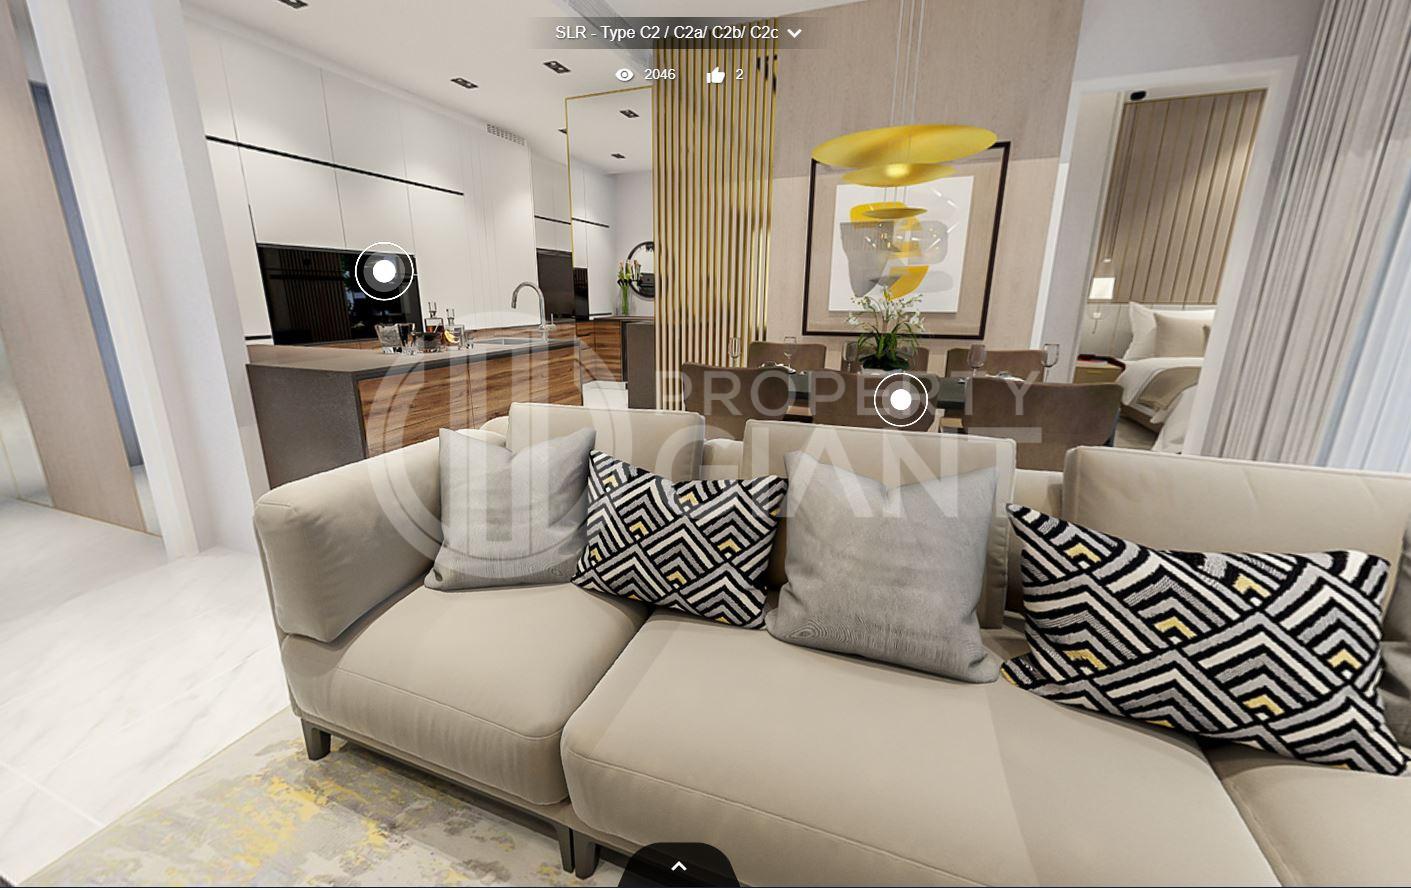 3D Virtual Tour of Sloane Residences 3 Bedroom Unit, Type C2/C2a/C2b/C2c